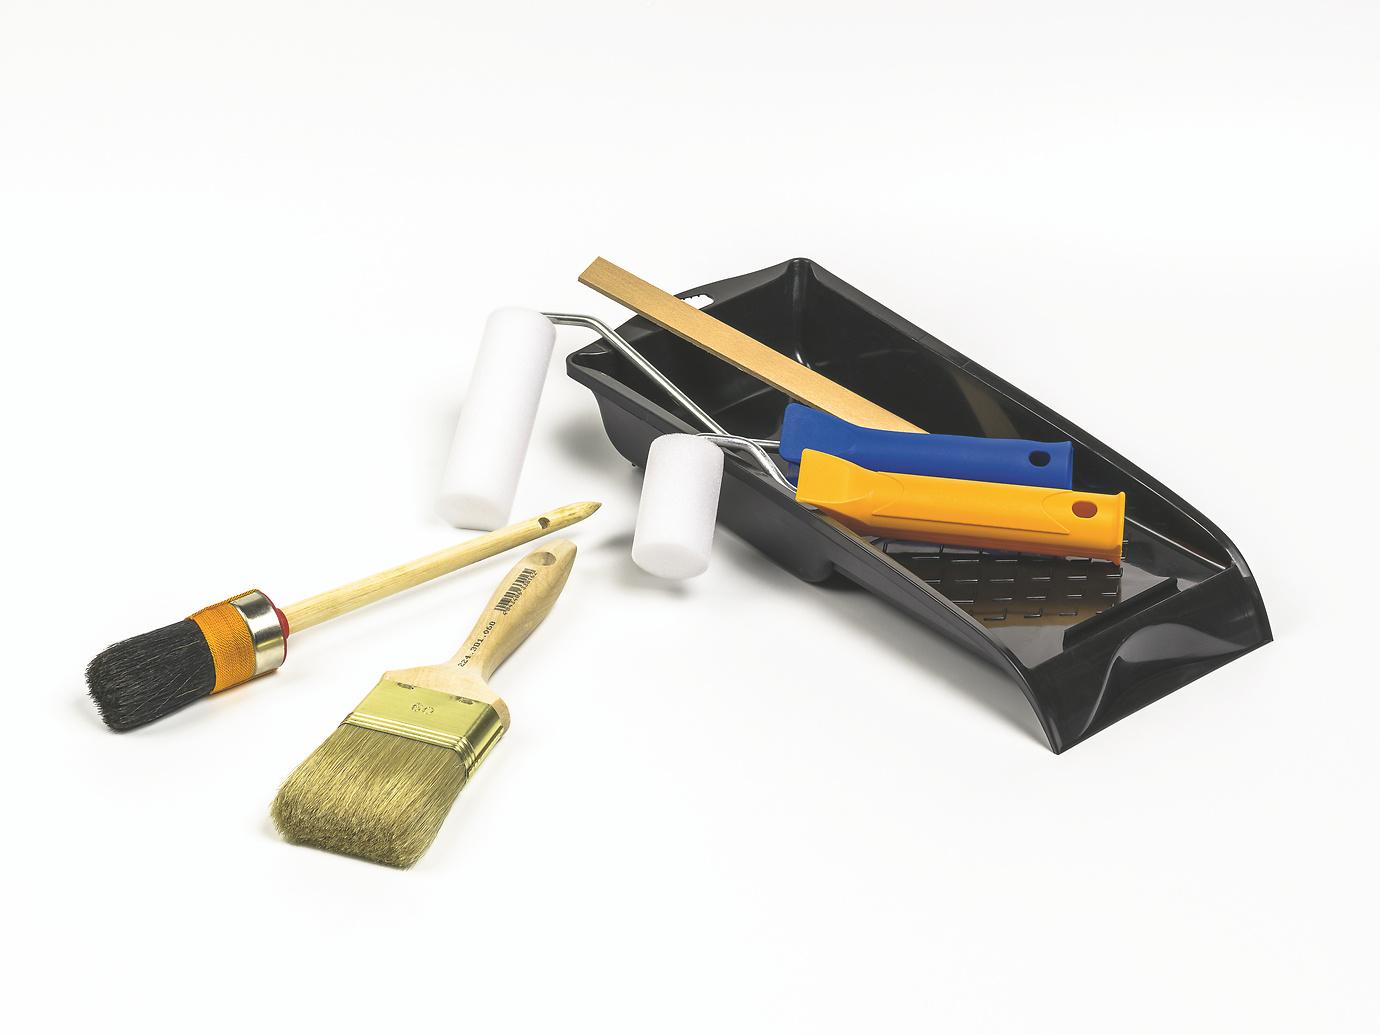 kunstharzlack und acryllack bereinander so klappt 39 s alpina lackieren. Black Bedroom Furniture Sets. Home Design Ideas